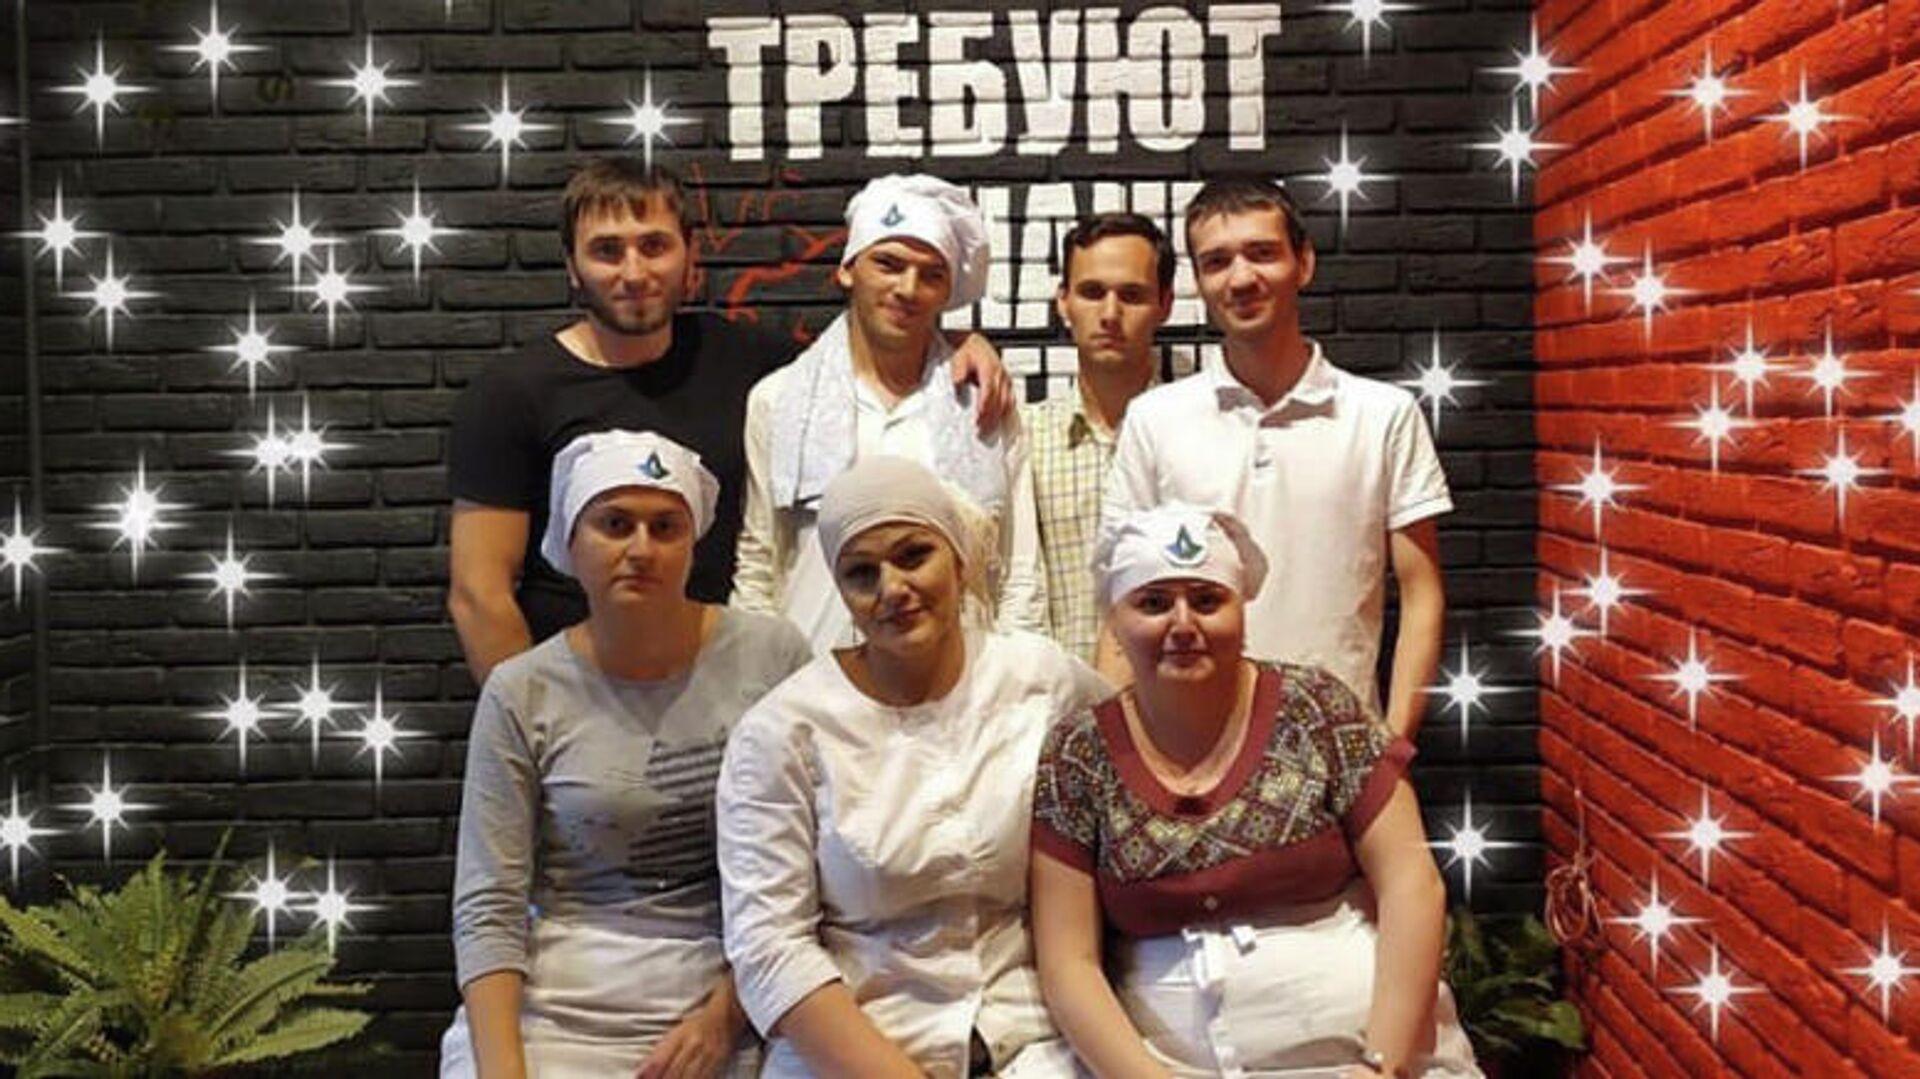 Команда кафе Время перемен  - РИА Новости, 1920, 19.11.2020